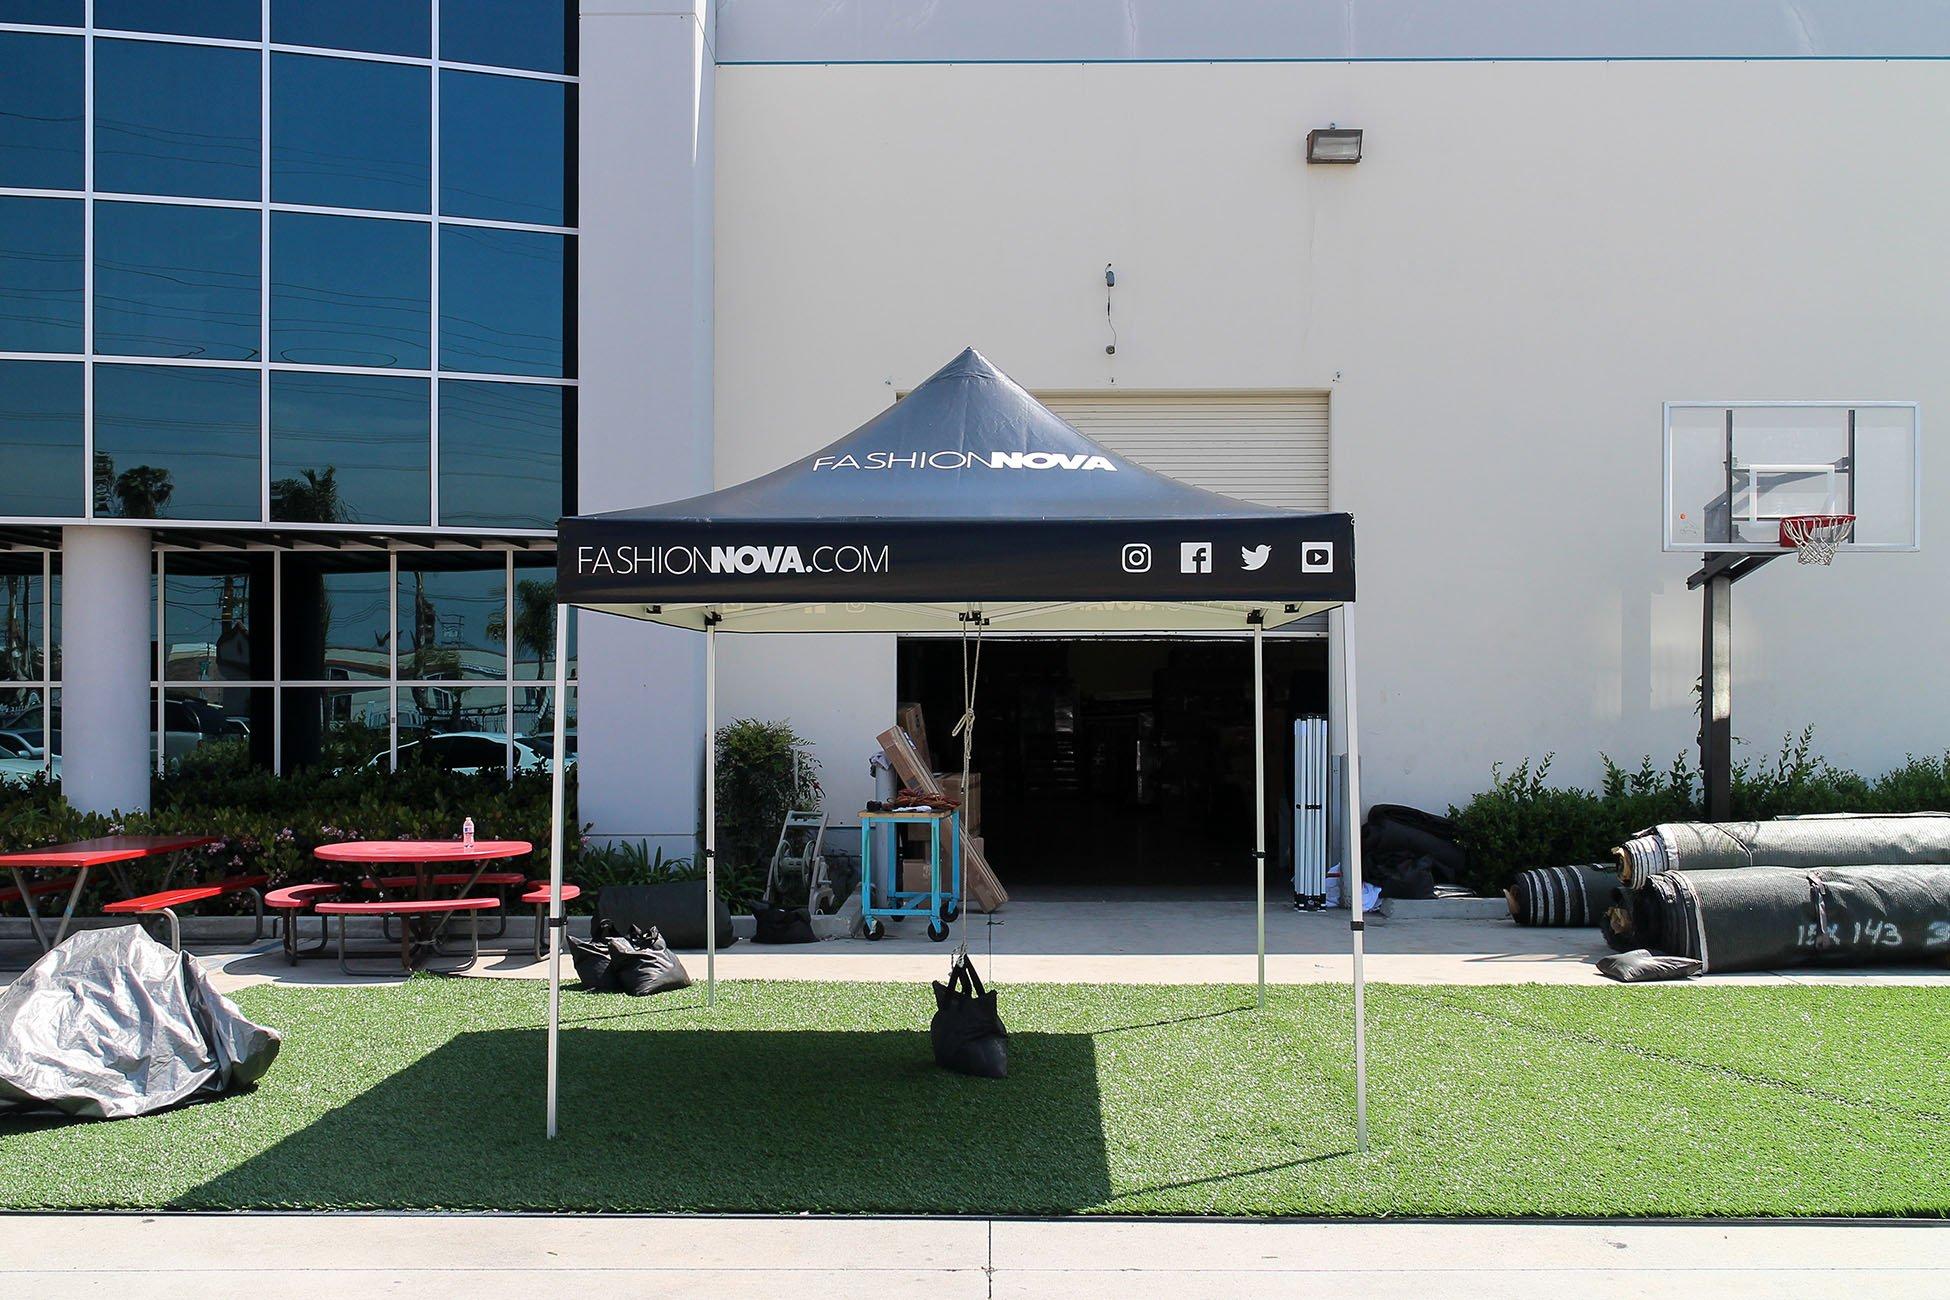 10x10-Fashion-Nova-tent